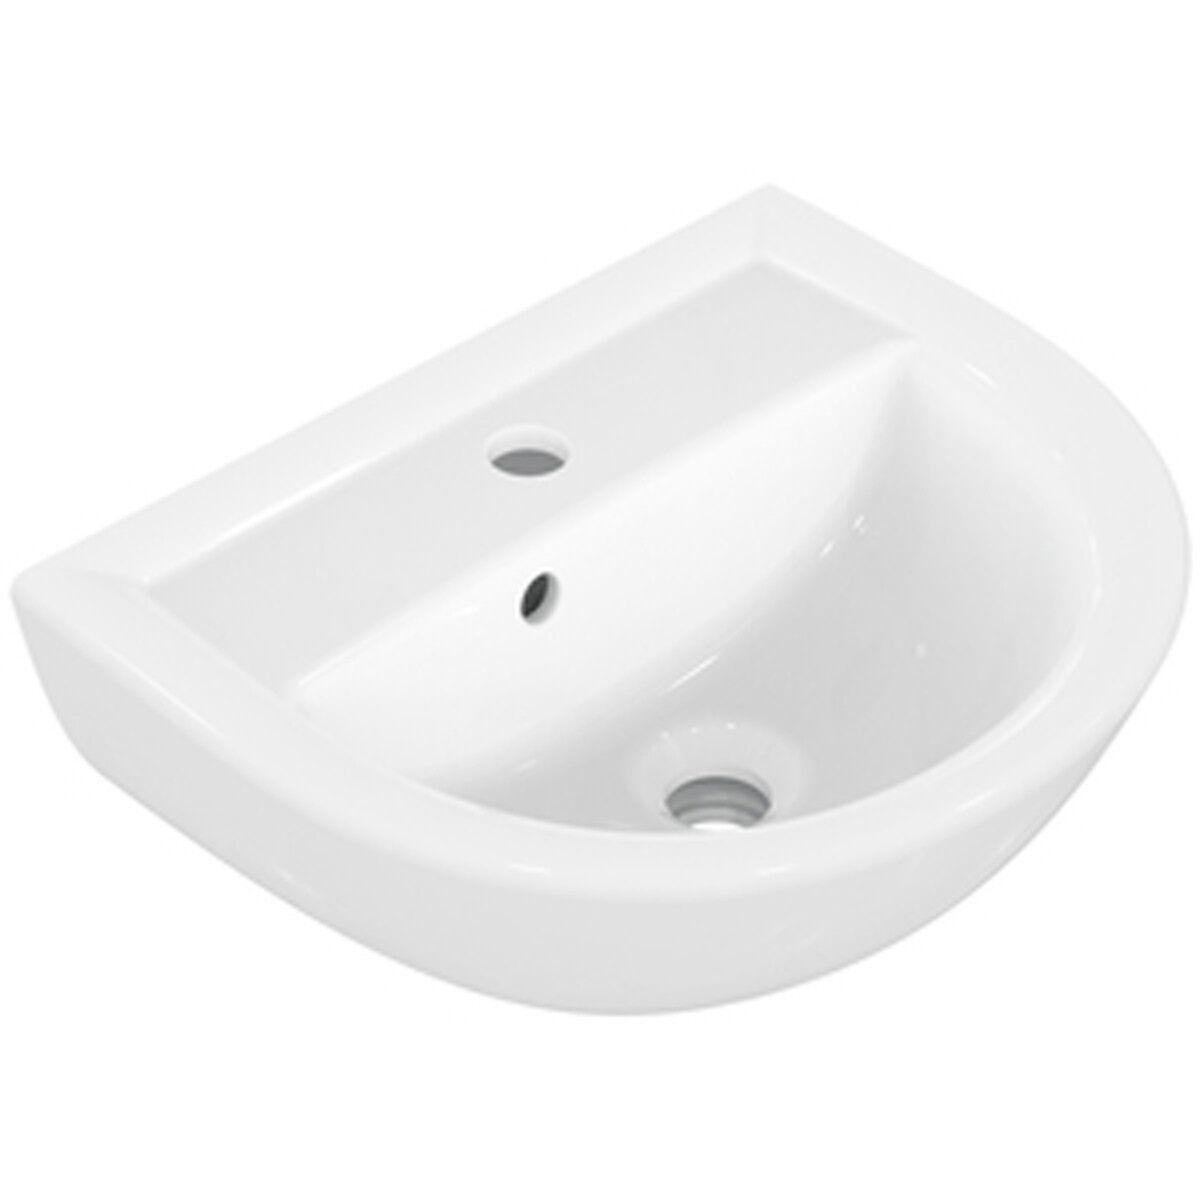 Sanibel 1001 Lavabo A16 lavabo lavabo 40,45, 50,55, 60,65cm blancoo